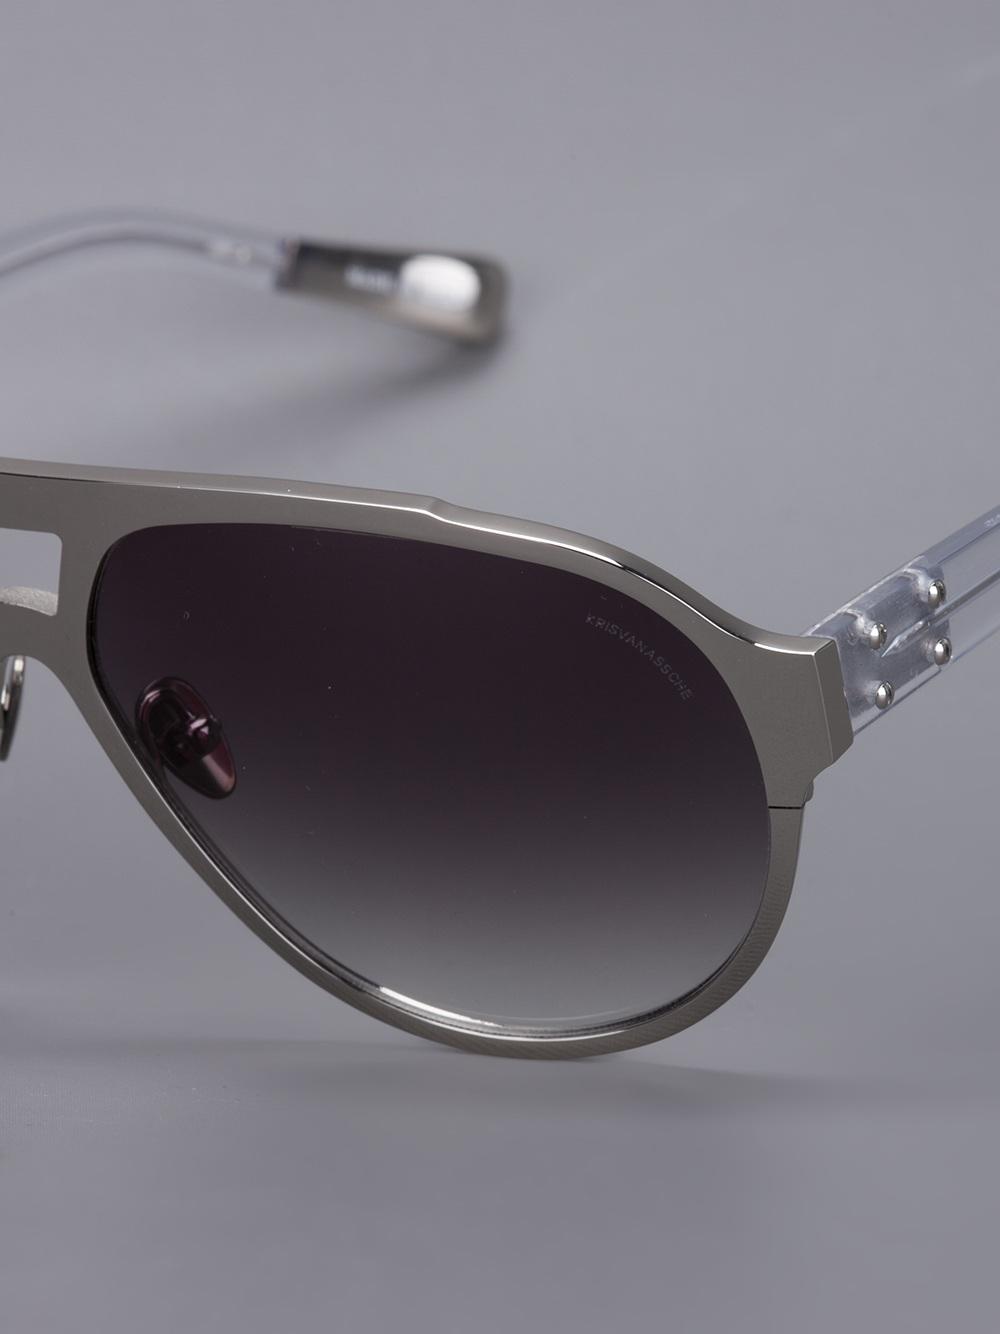 Oakley Fuel Cell Sunglasses >> Kris Van Assche Aviator Frame Sunglasses in Metallic (Gray) for Men - Lyst